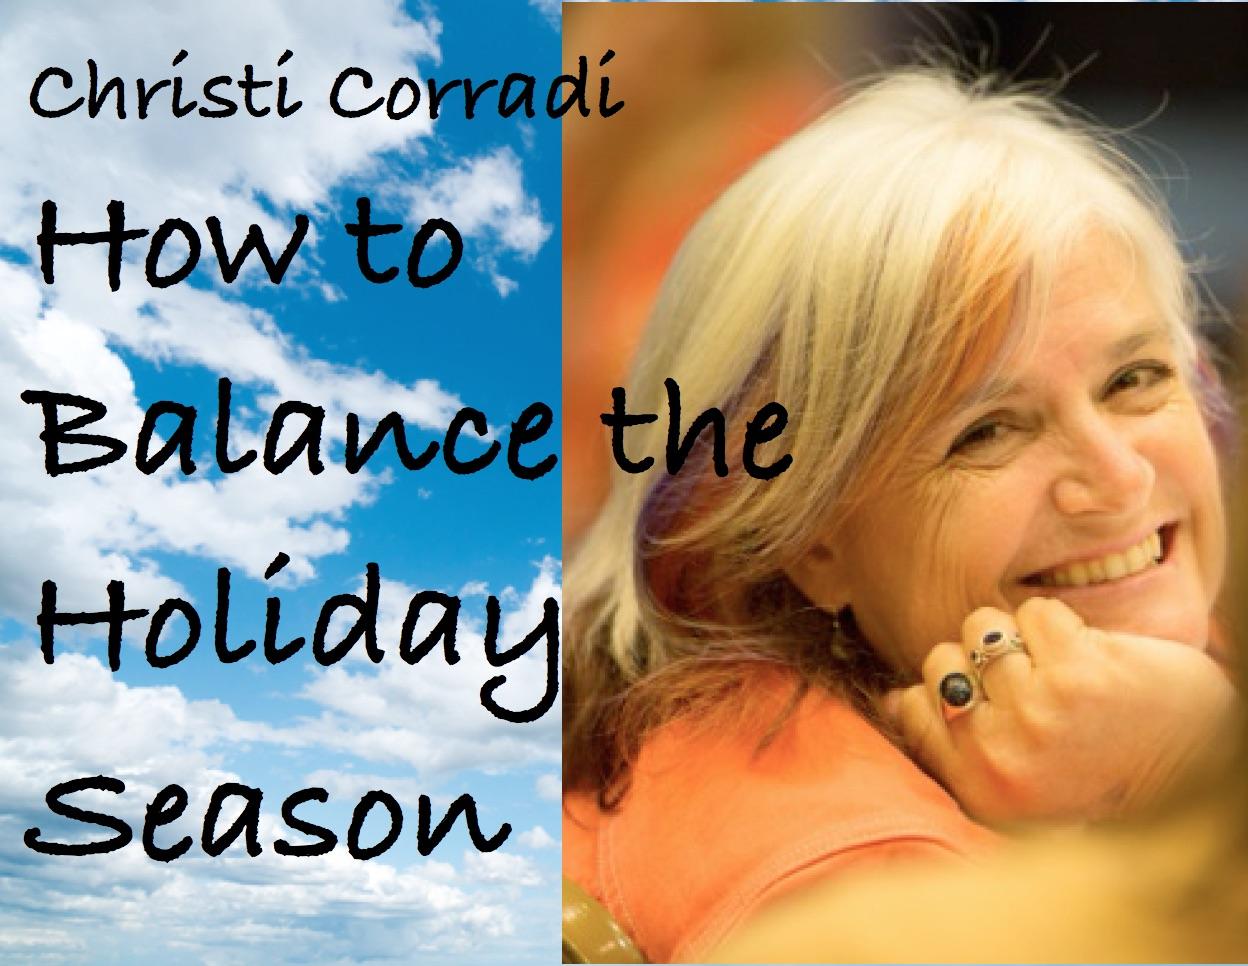 How to Balance the Holiday Season